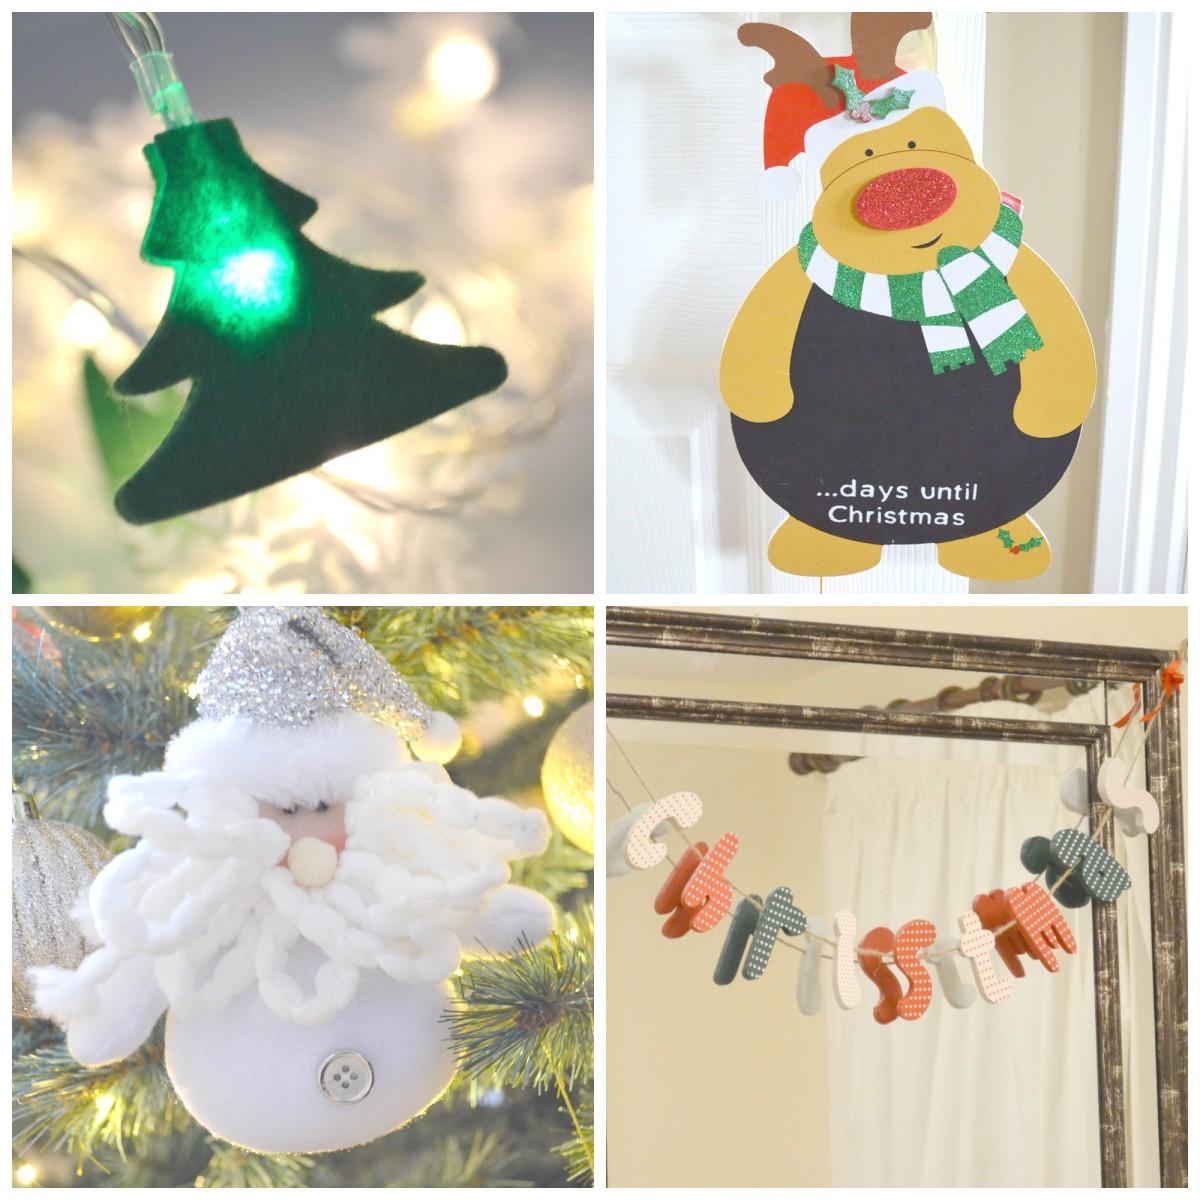 Home Bargains Christmas Range